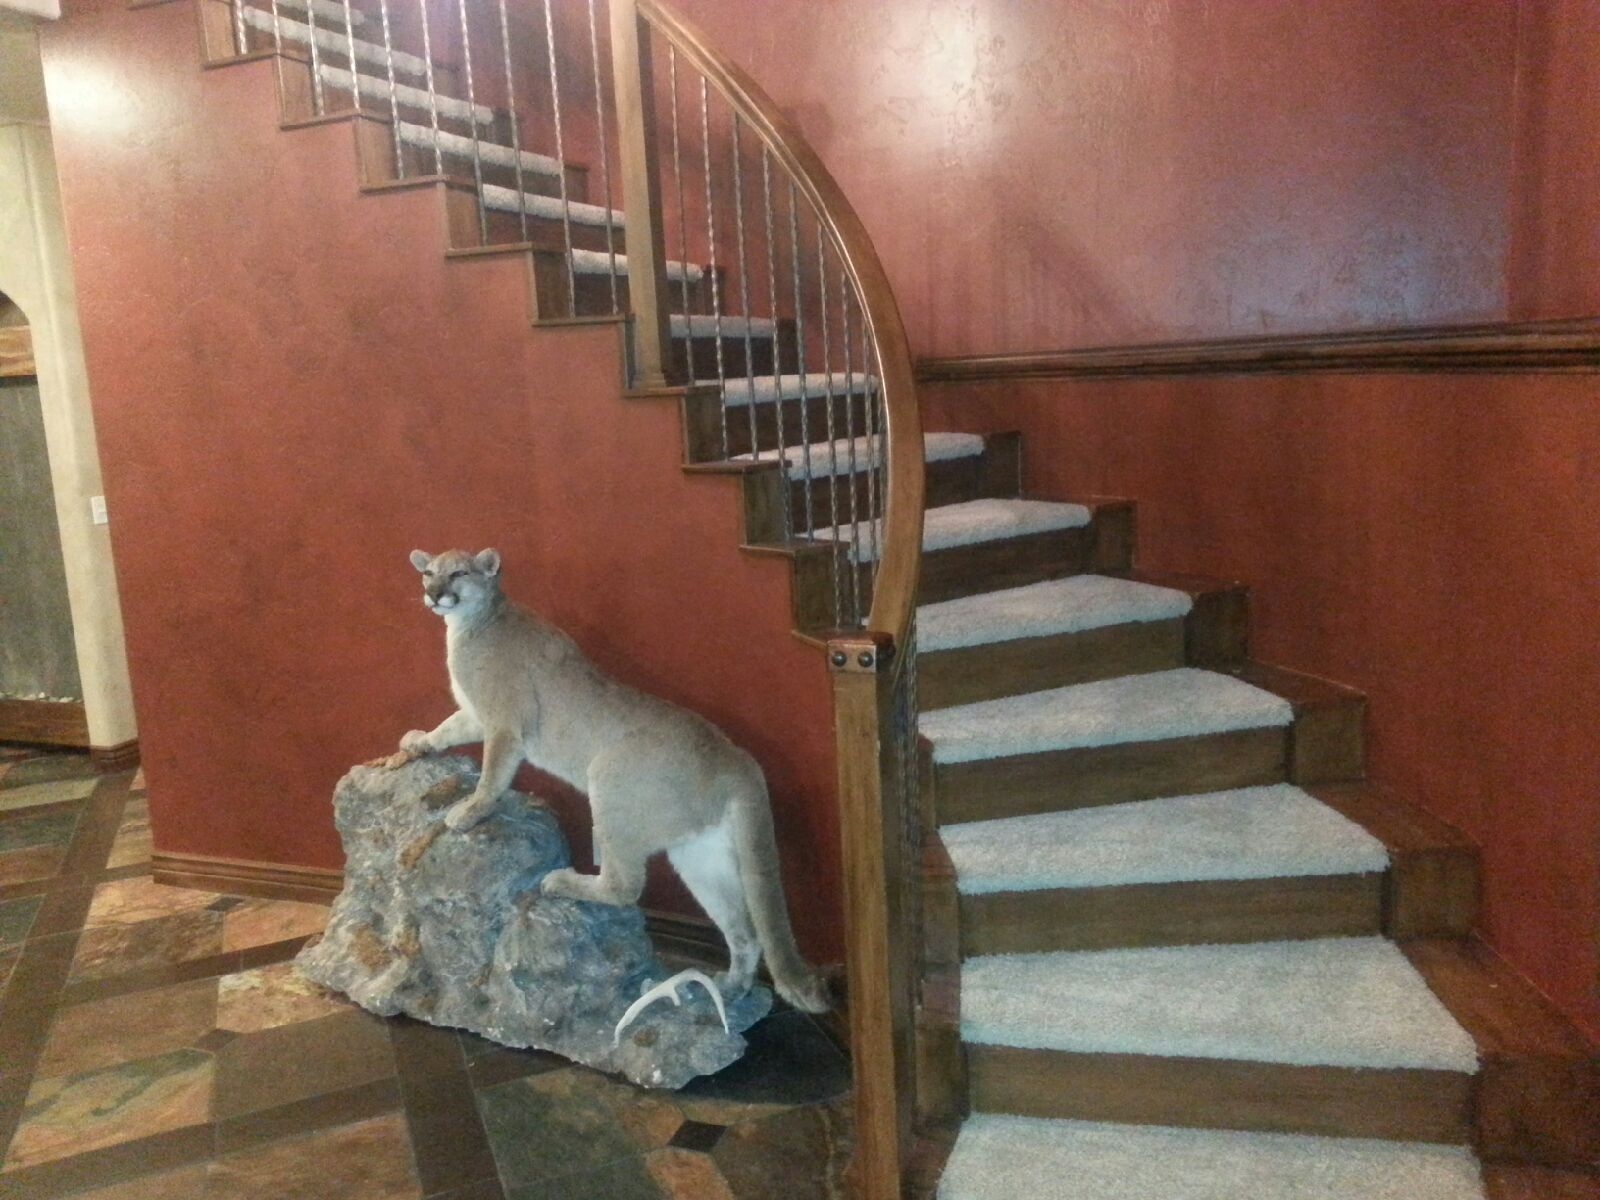 Stainmaster Pet Protect Carpet Affordable carpet, Carpet